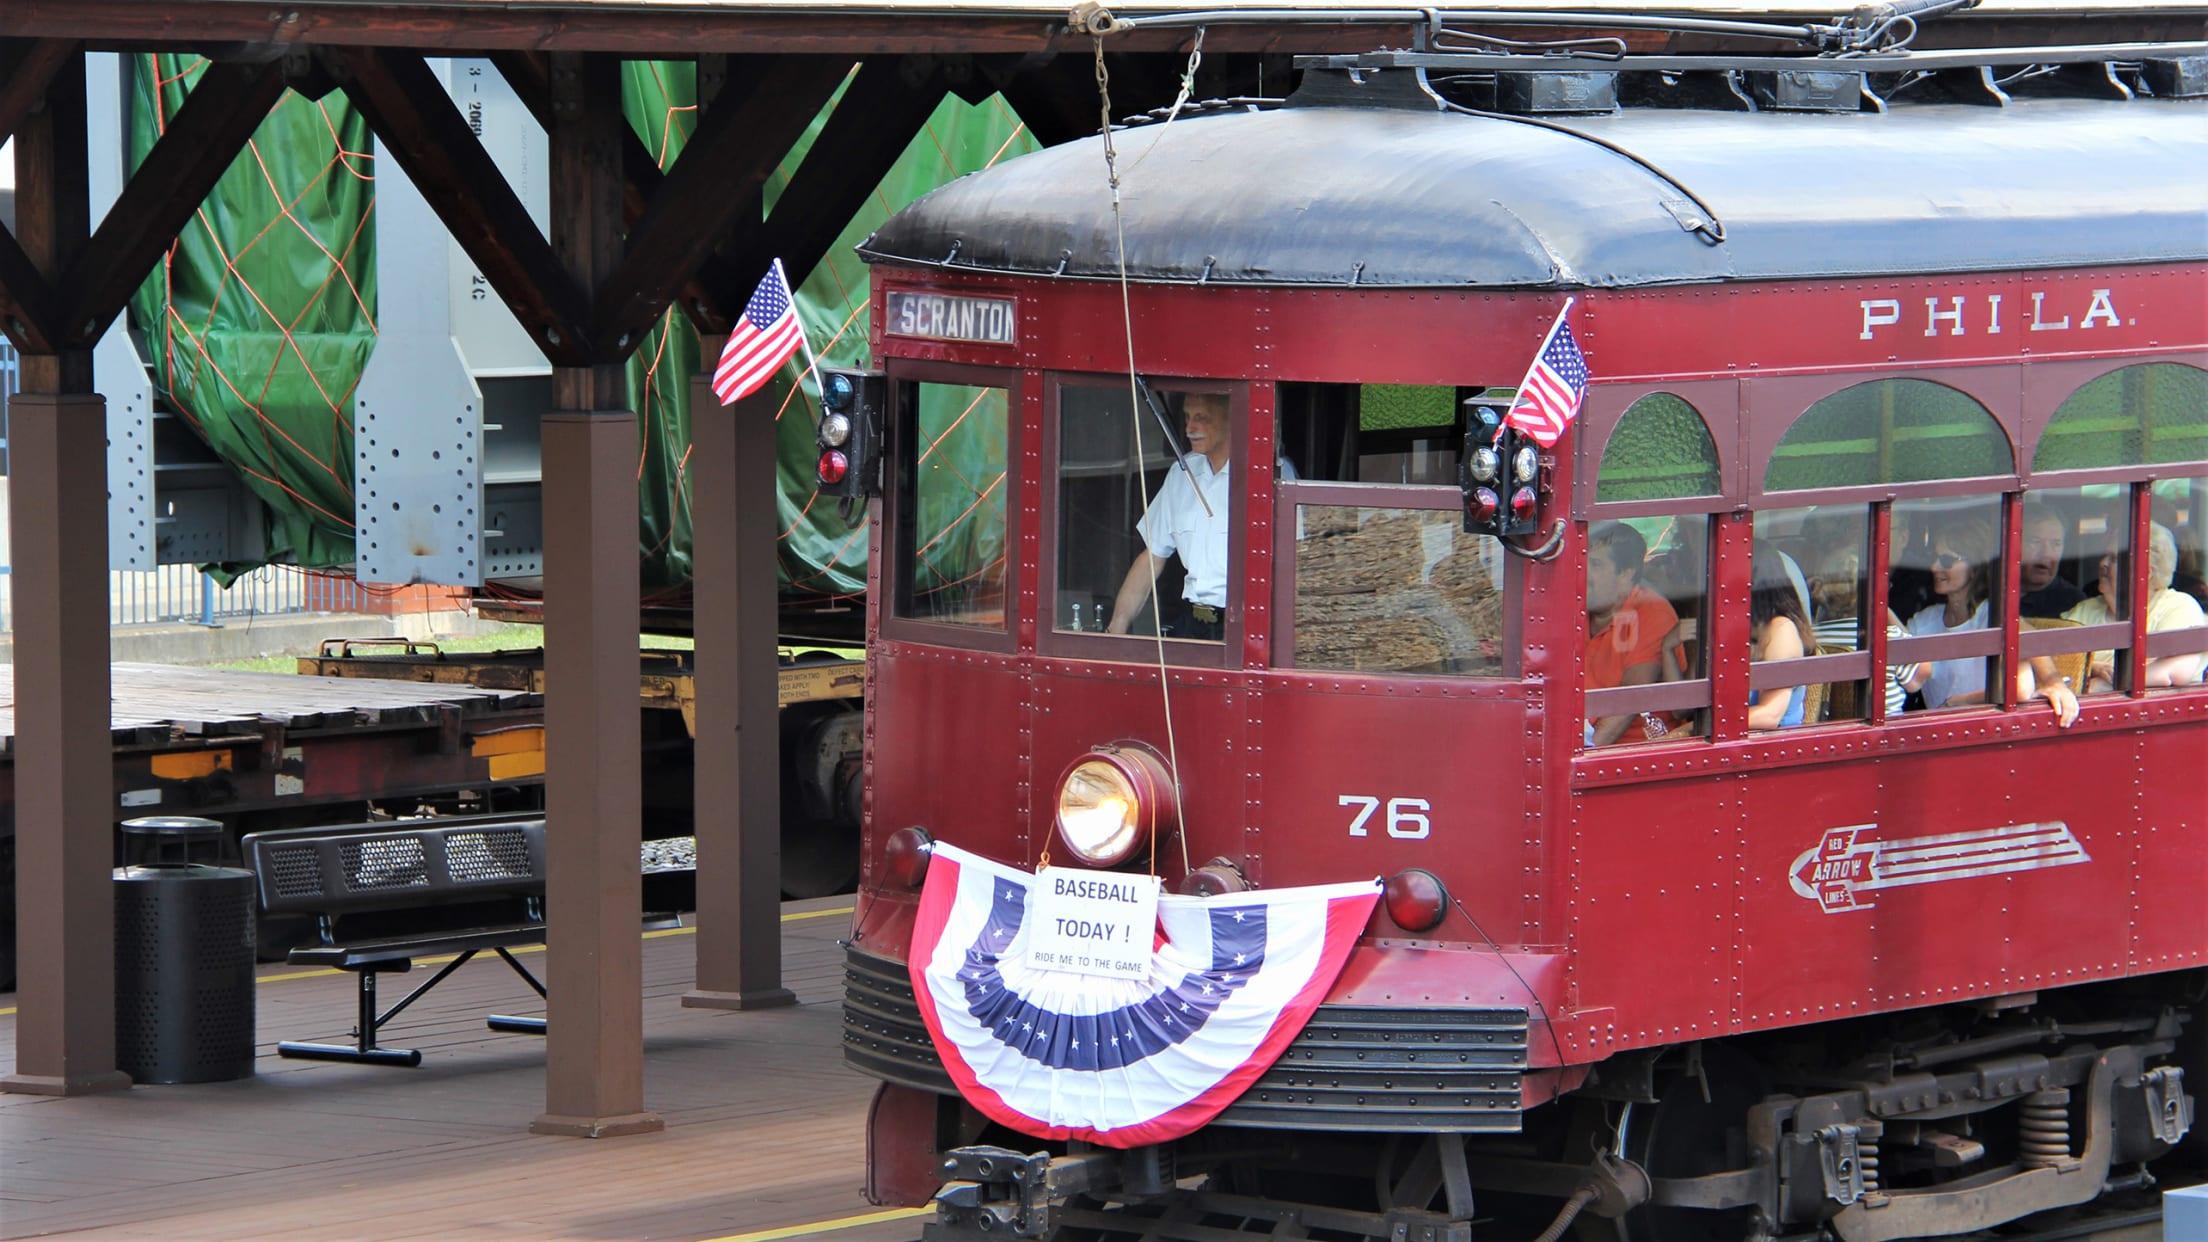 2568-Baseball-trolley